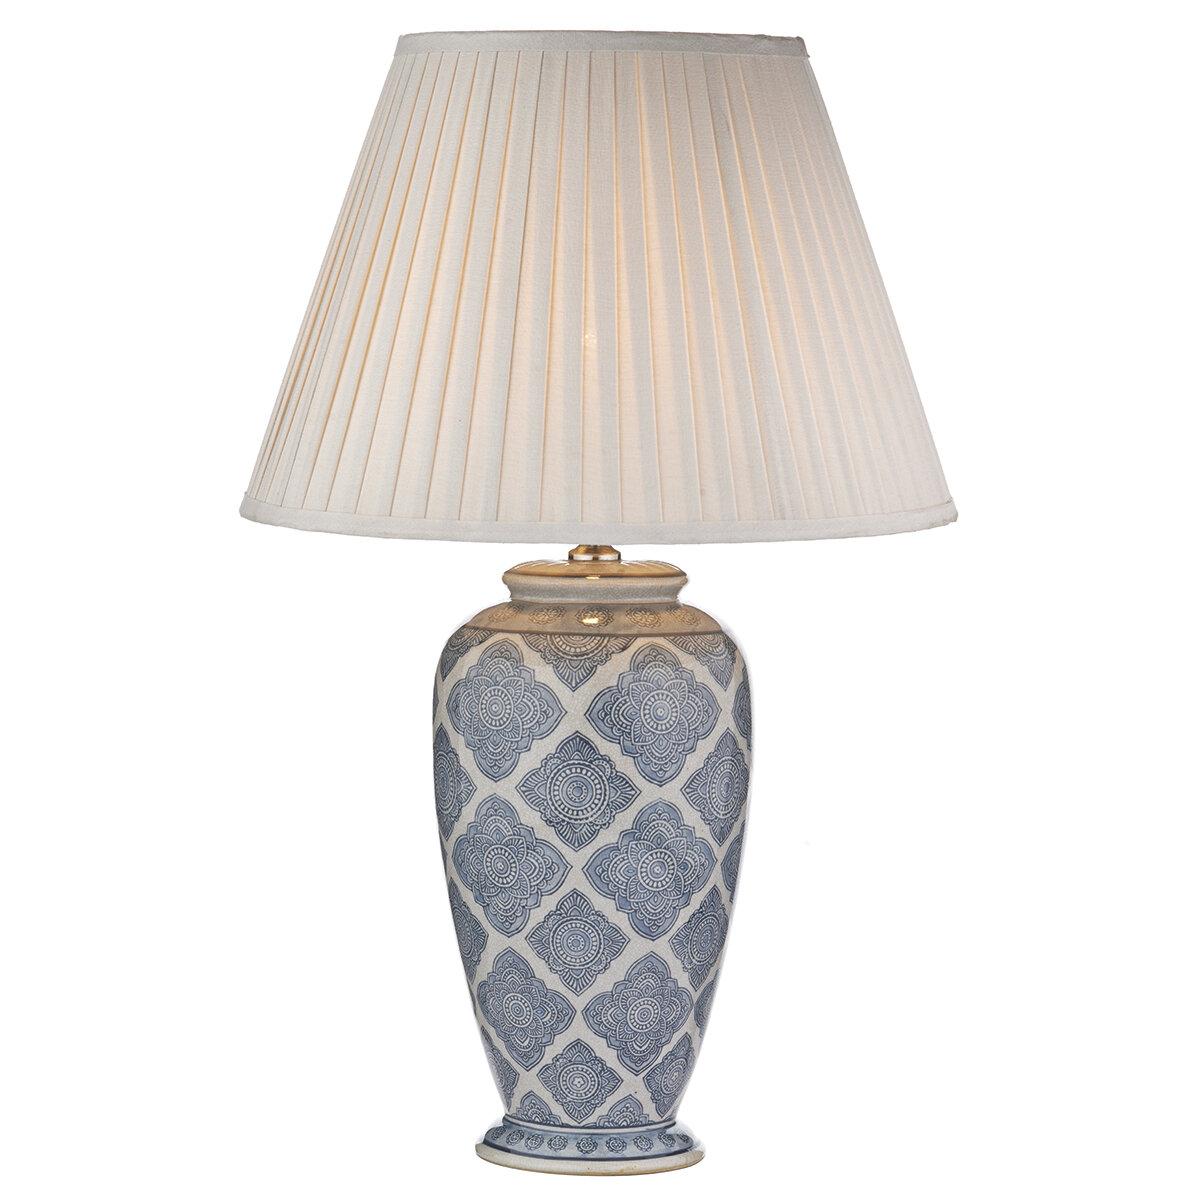 Americana in 2020 | Lamp, Table lamp, Table